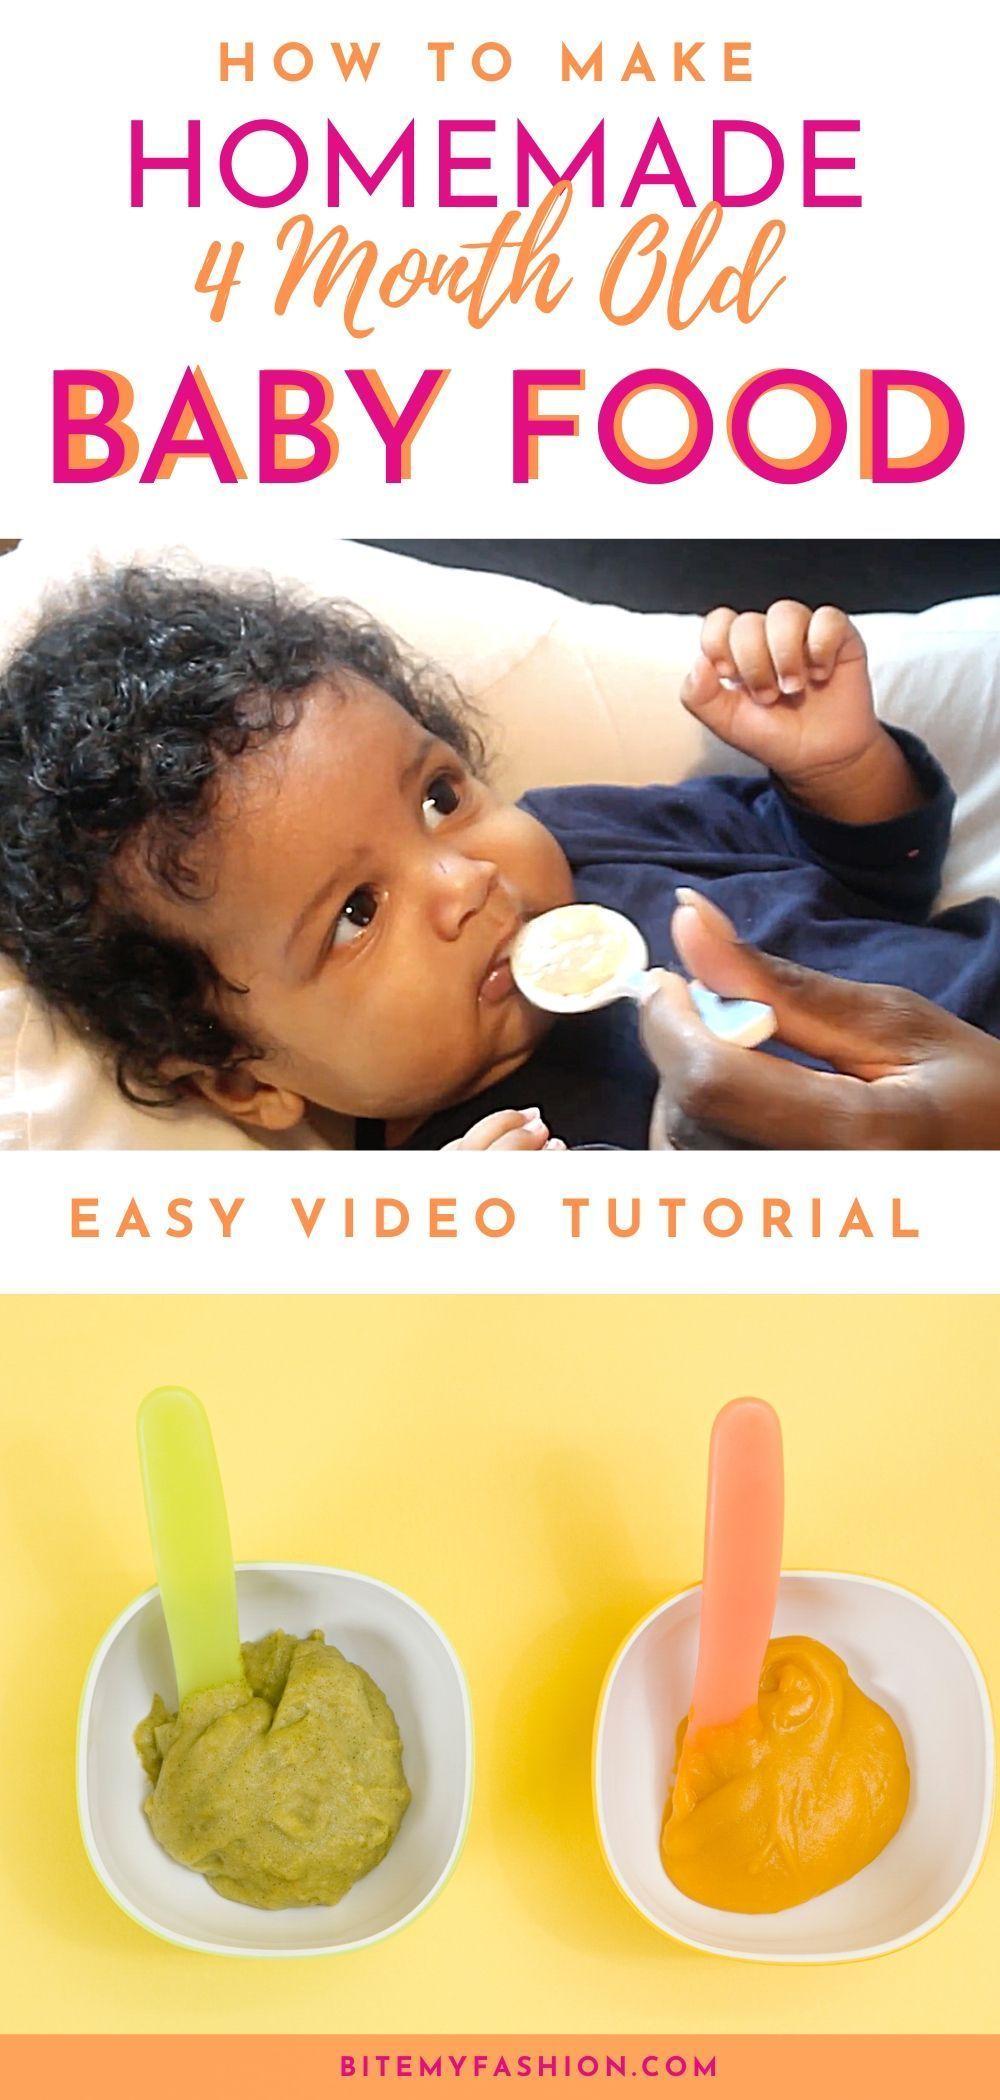 #Homemadebabyfood - How to make homemade baby food! A ...